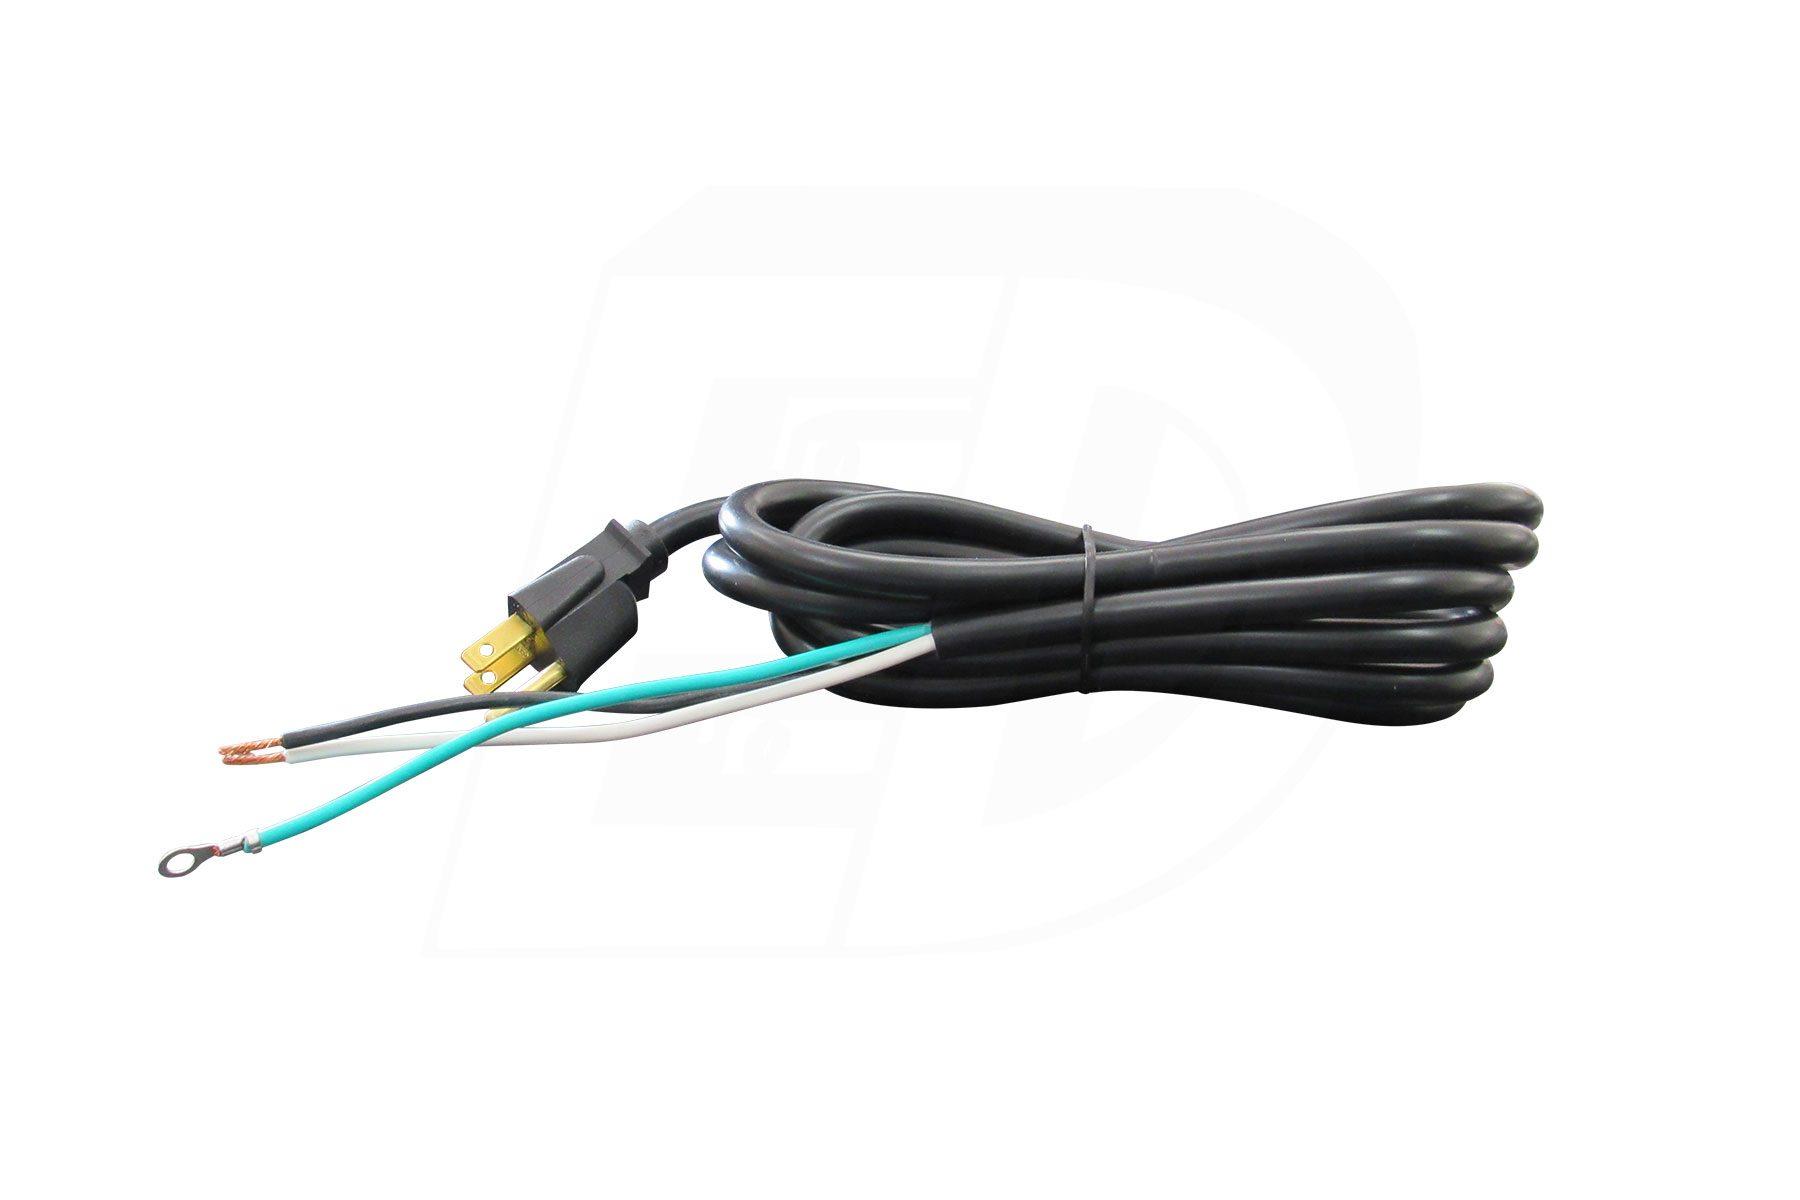 SJTWA AC Power Cord